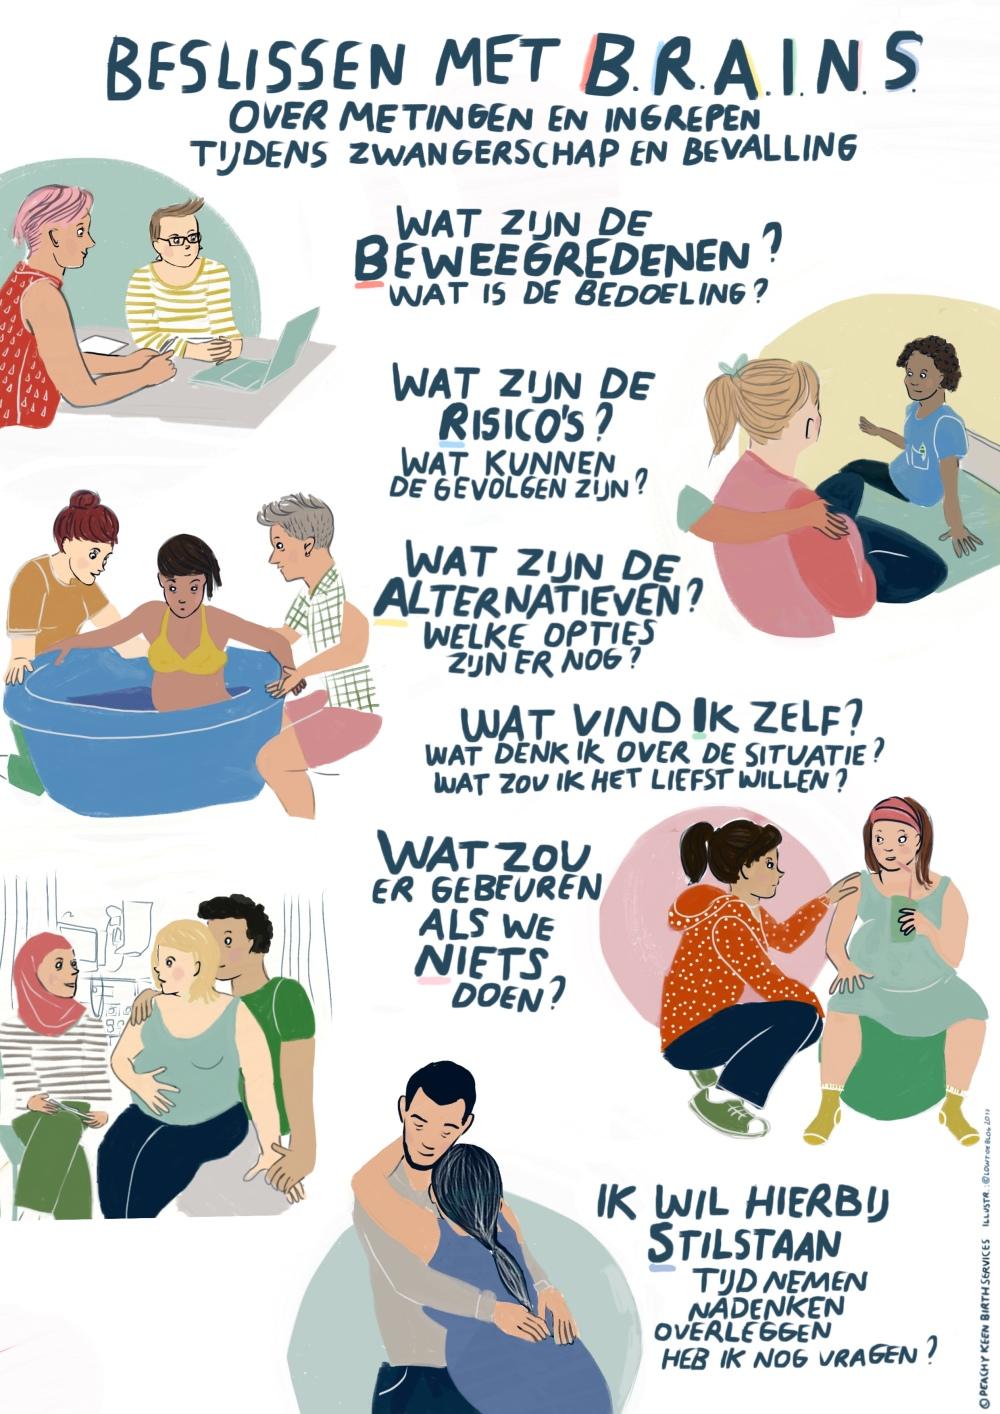 Brains_poster_NL